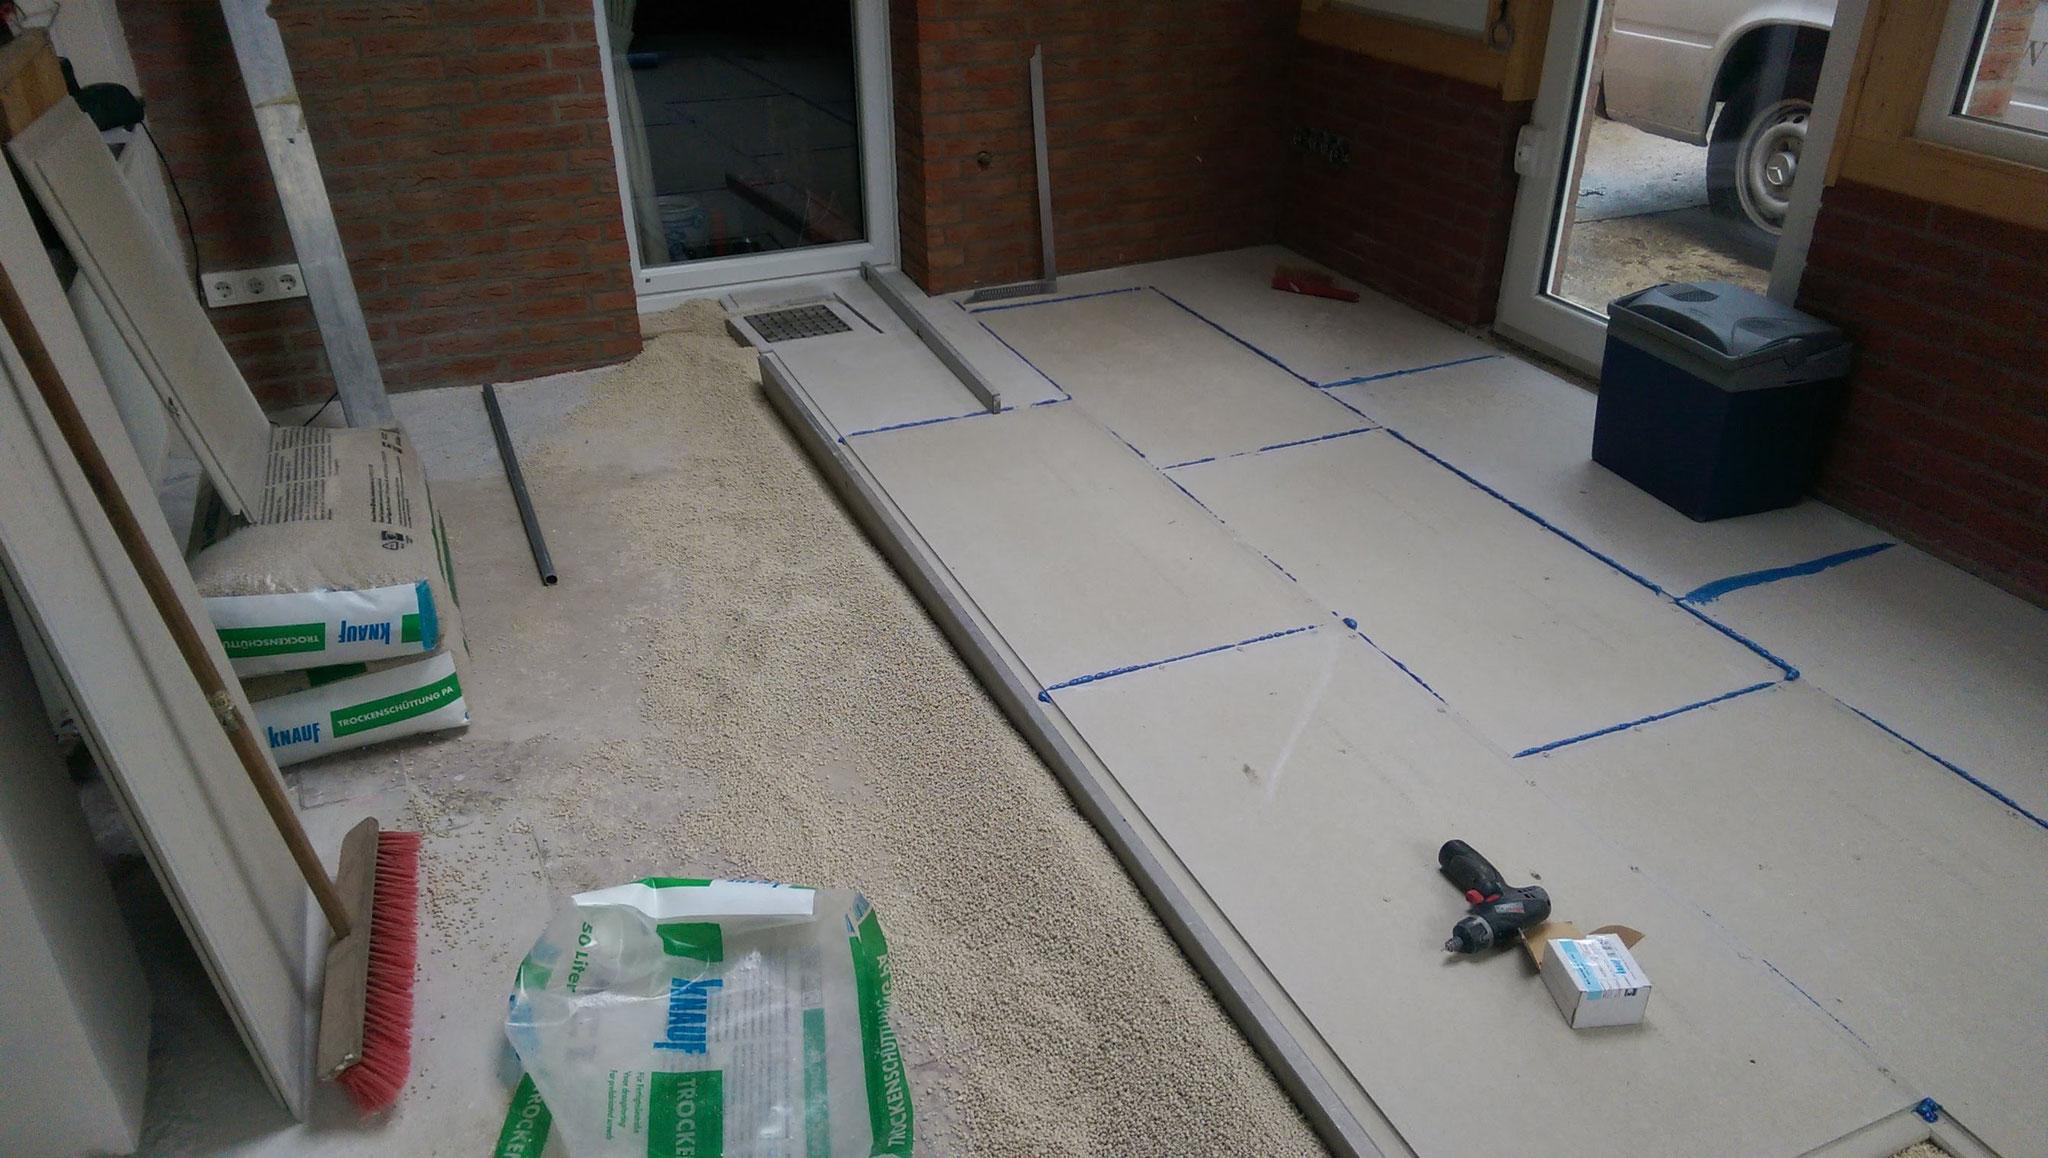 Fußboden Estrich ~ Fußboden estrich verlegen estrich verlegen schritt für schritt